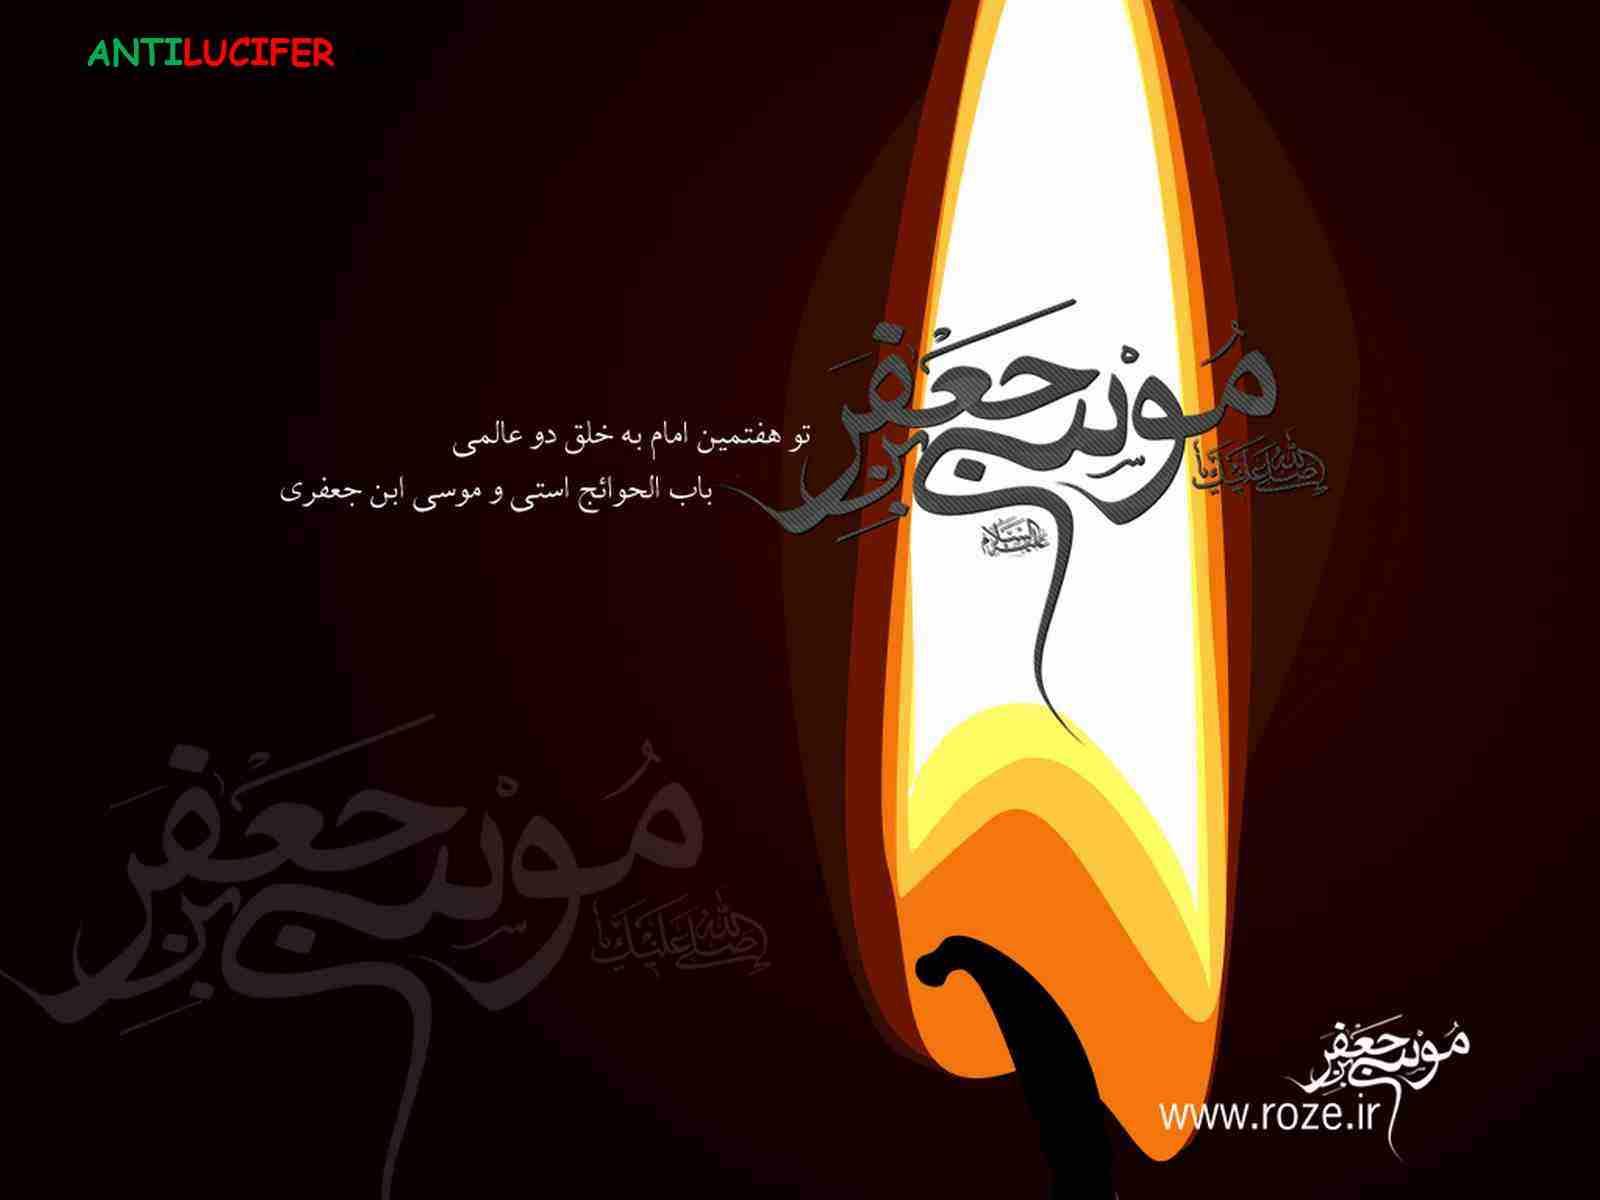 عکس شهتدت امام موسی کاظم